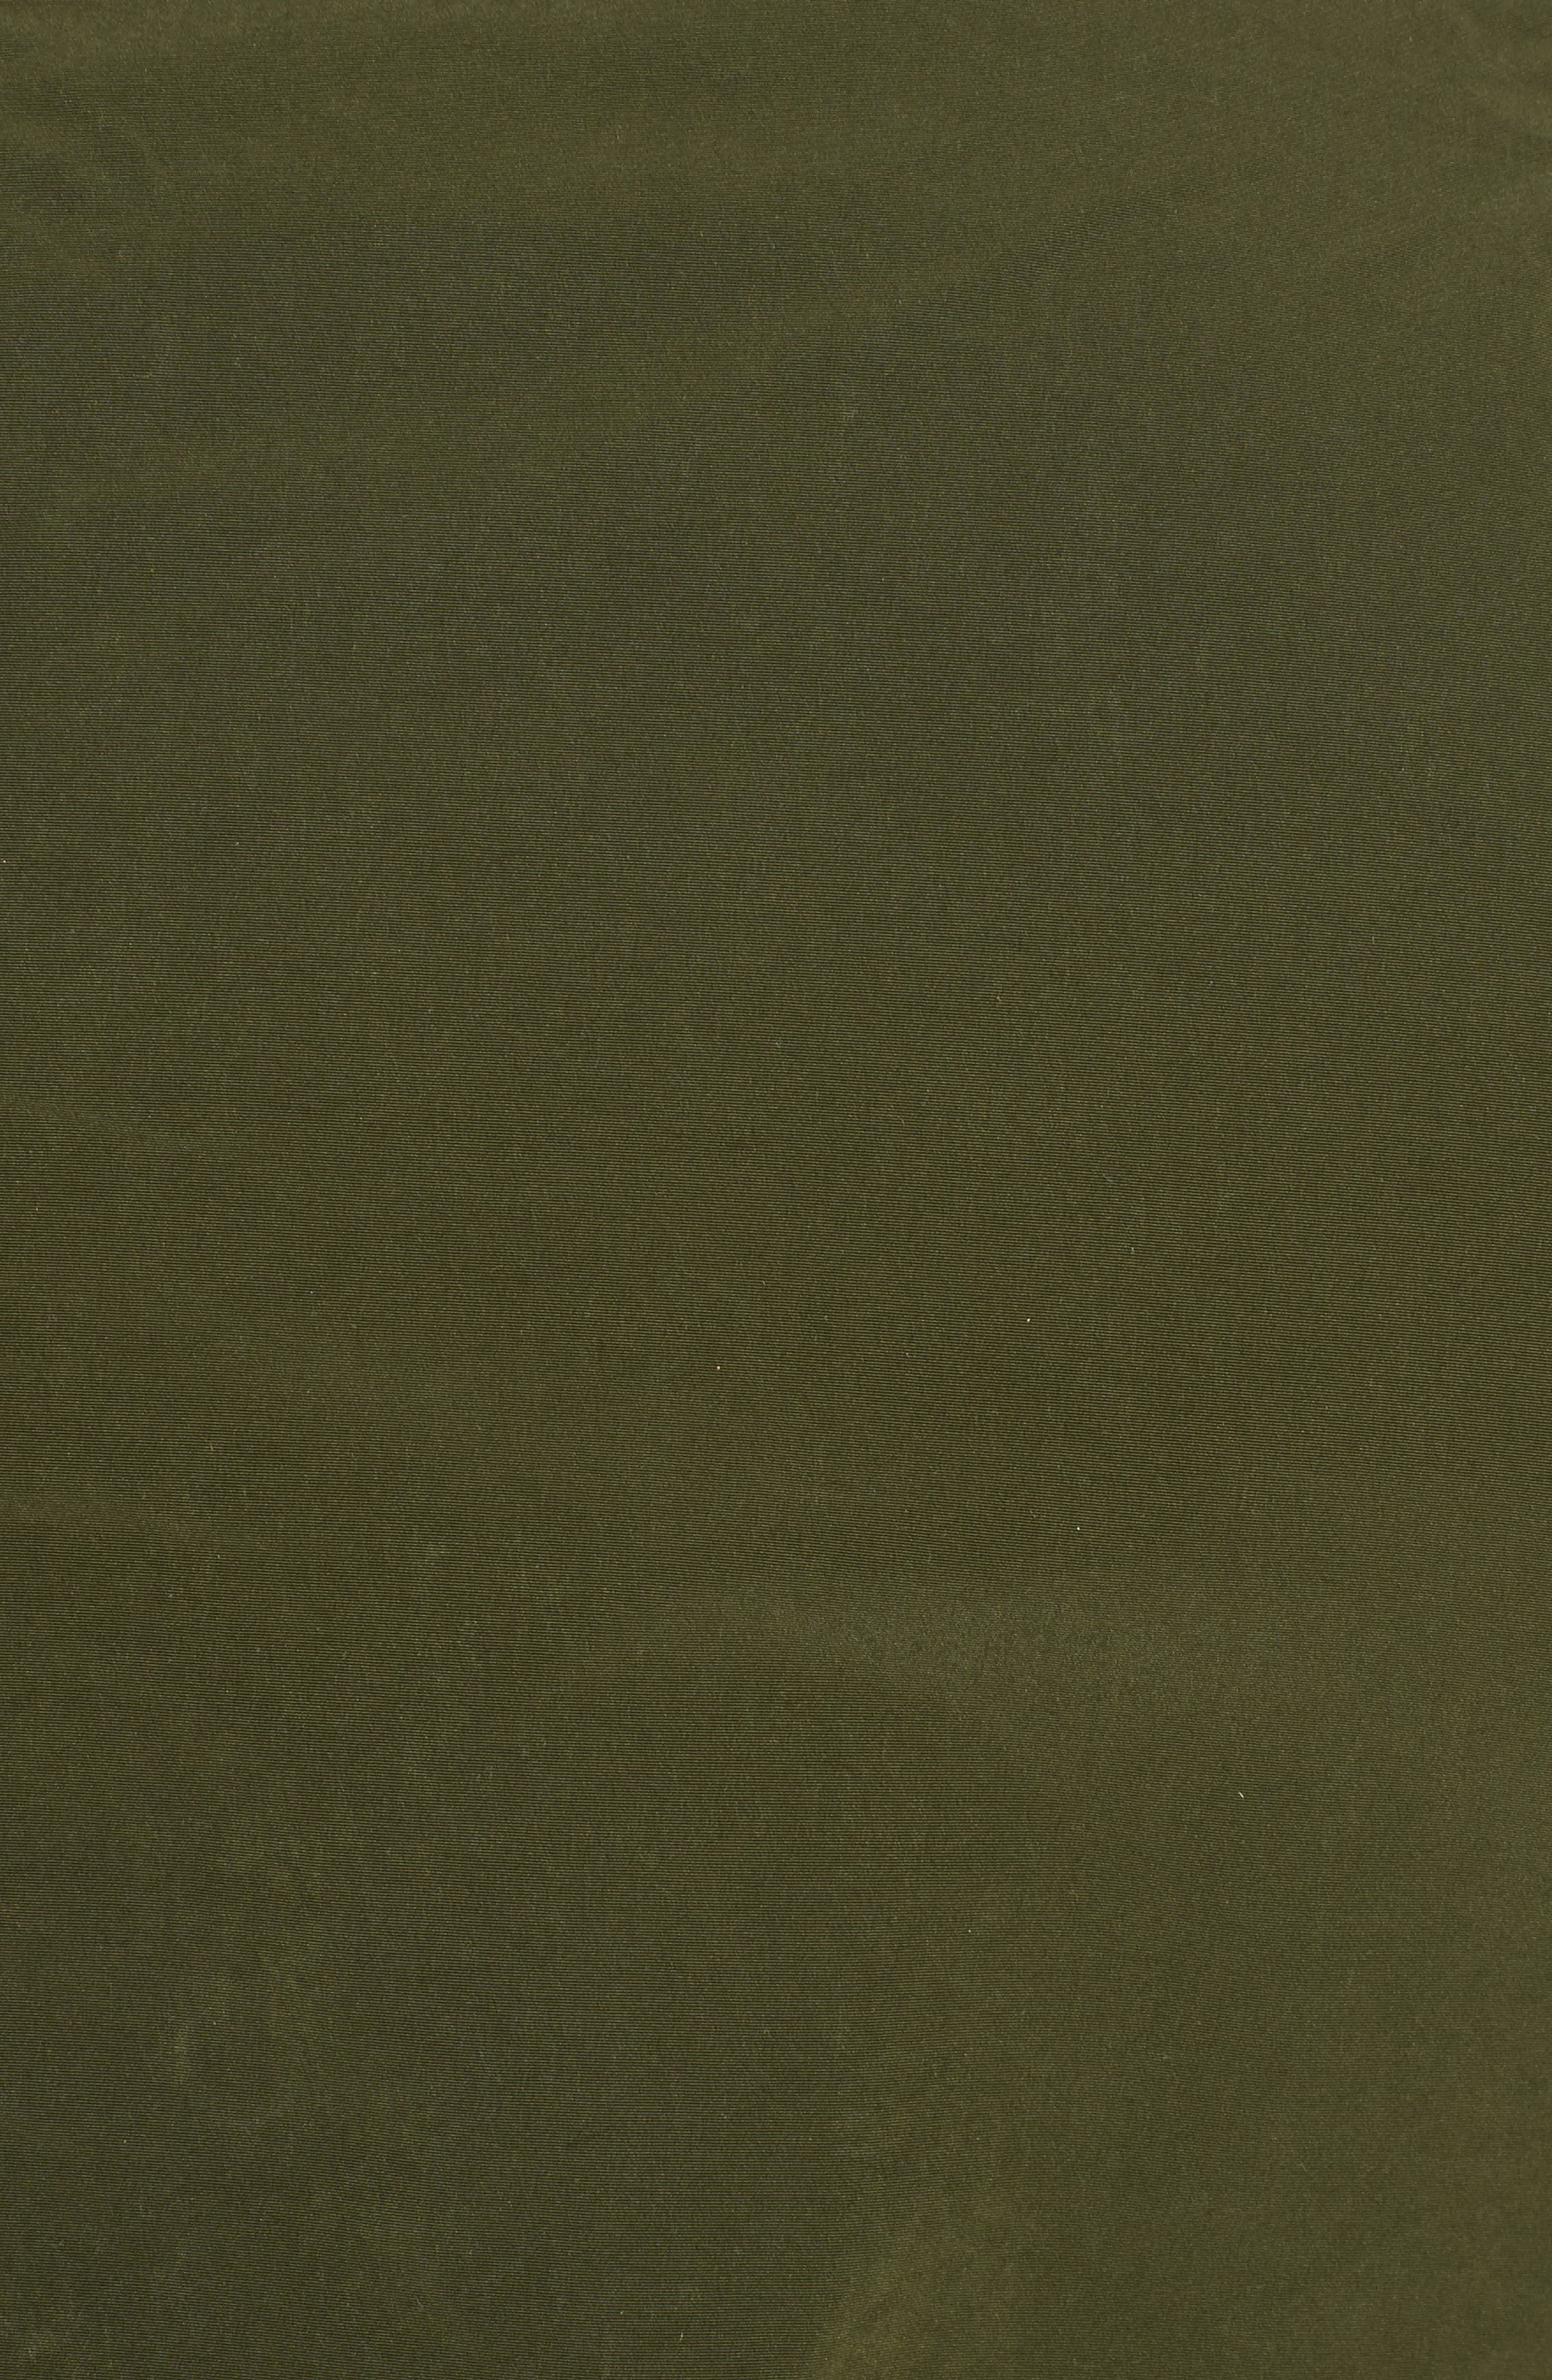 Wax Sanded Jacket,                             Alternate thumbnail 6, color,